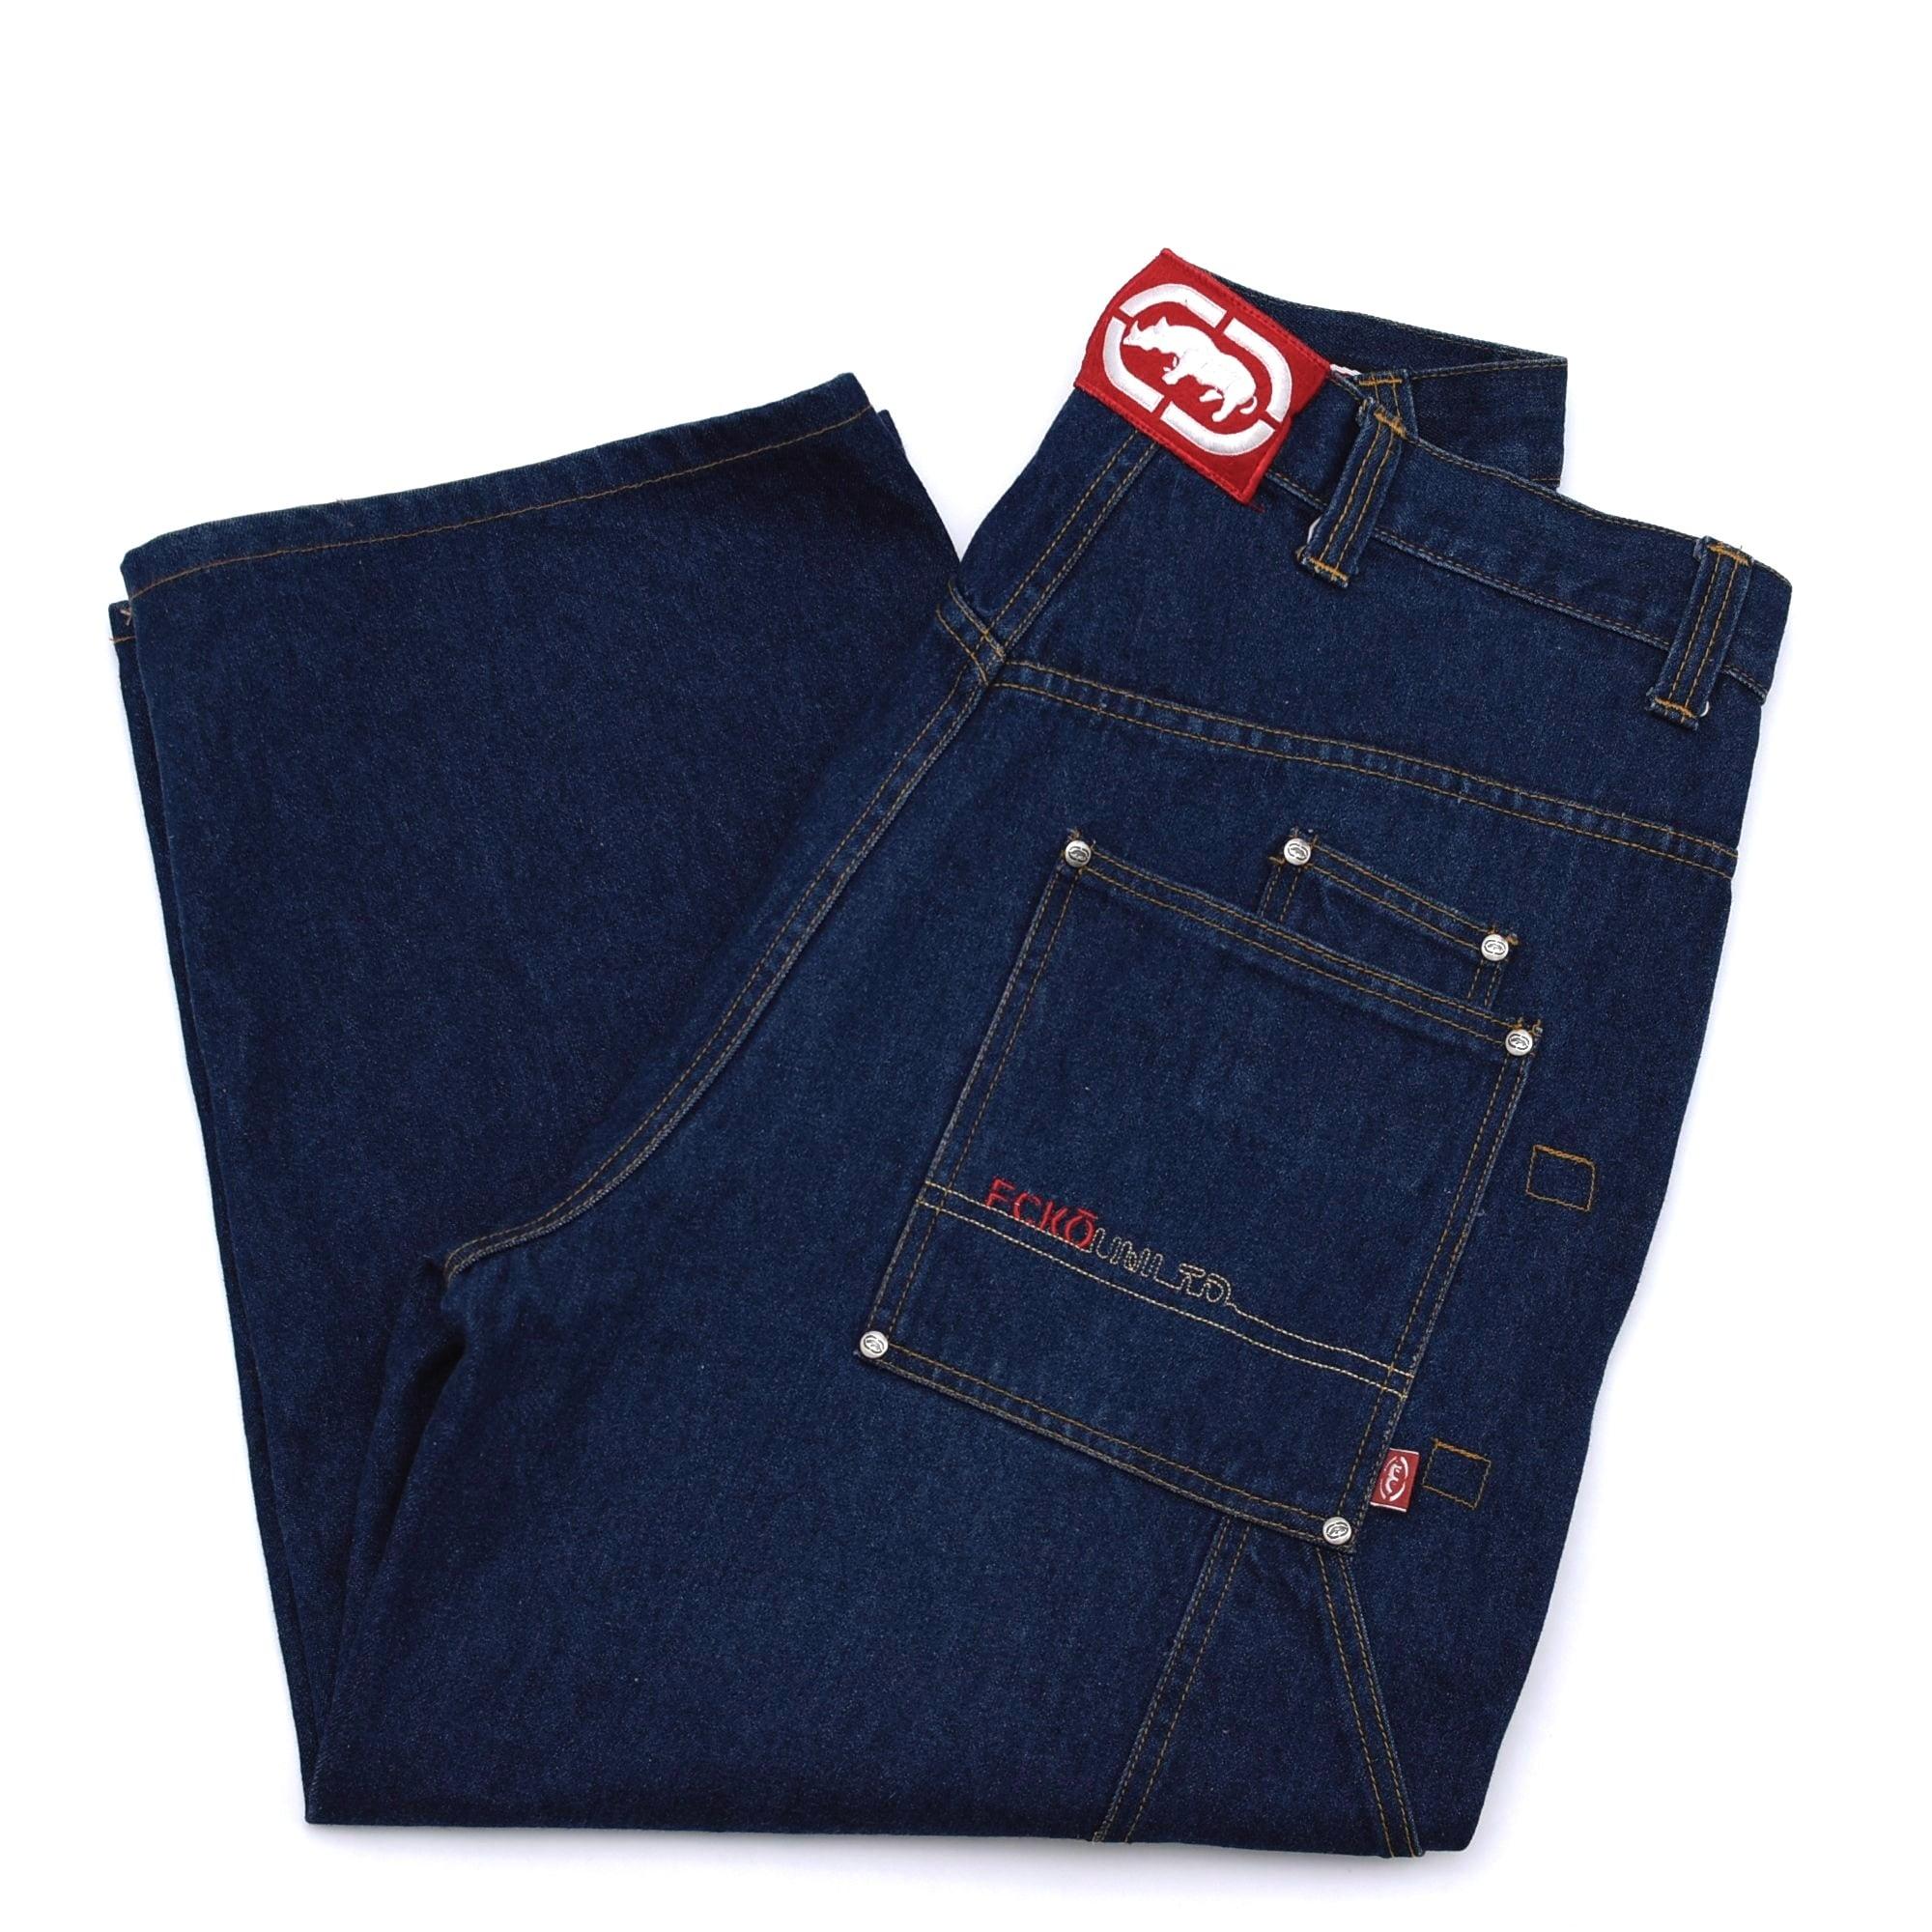 90〜00s ECKO UNLTD.co. denim baggy pants